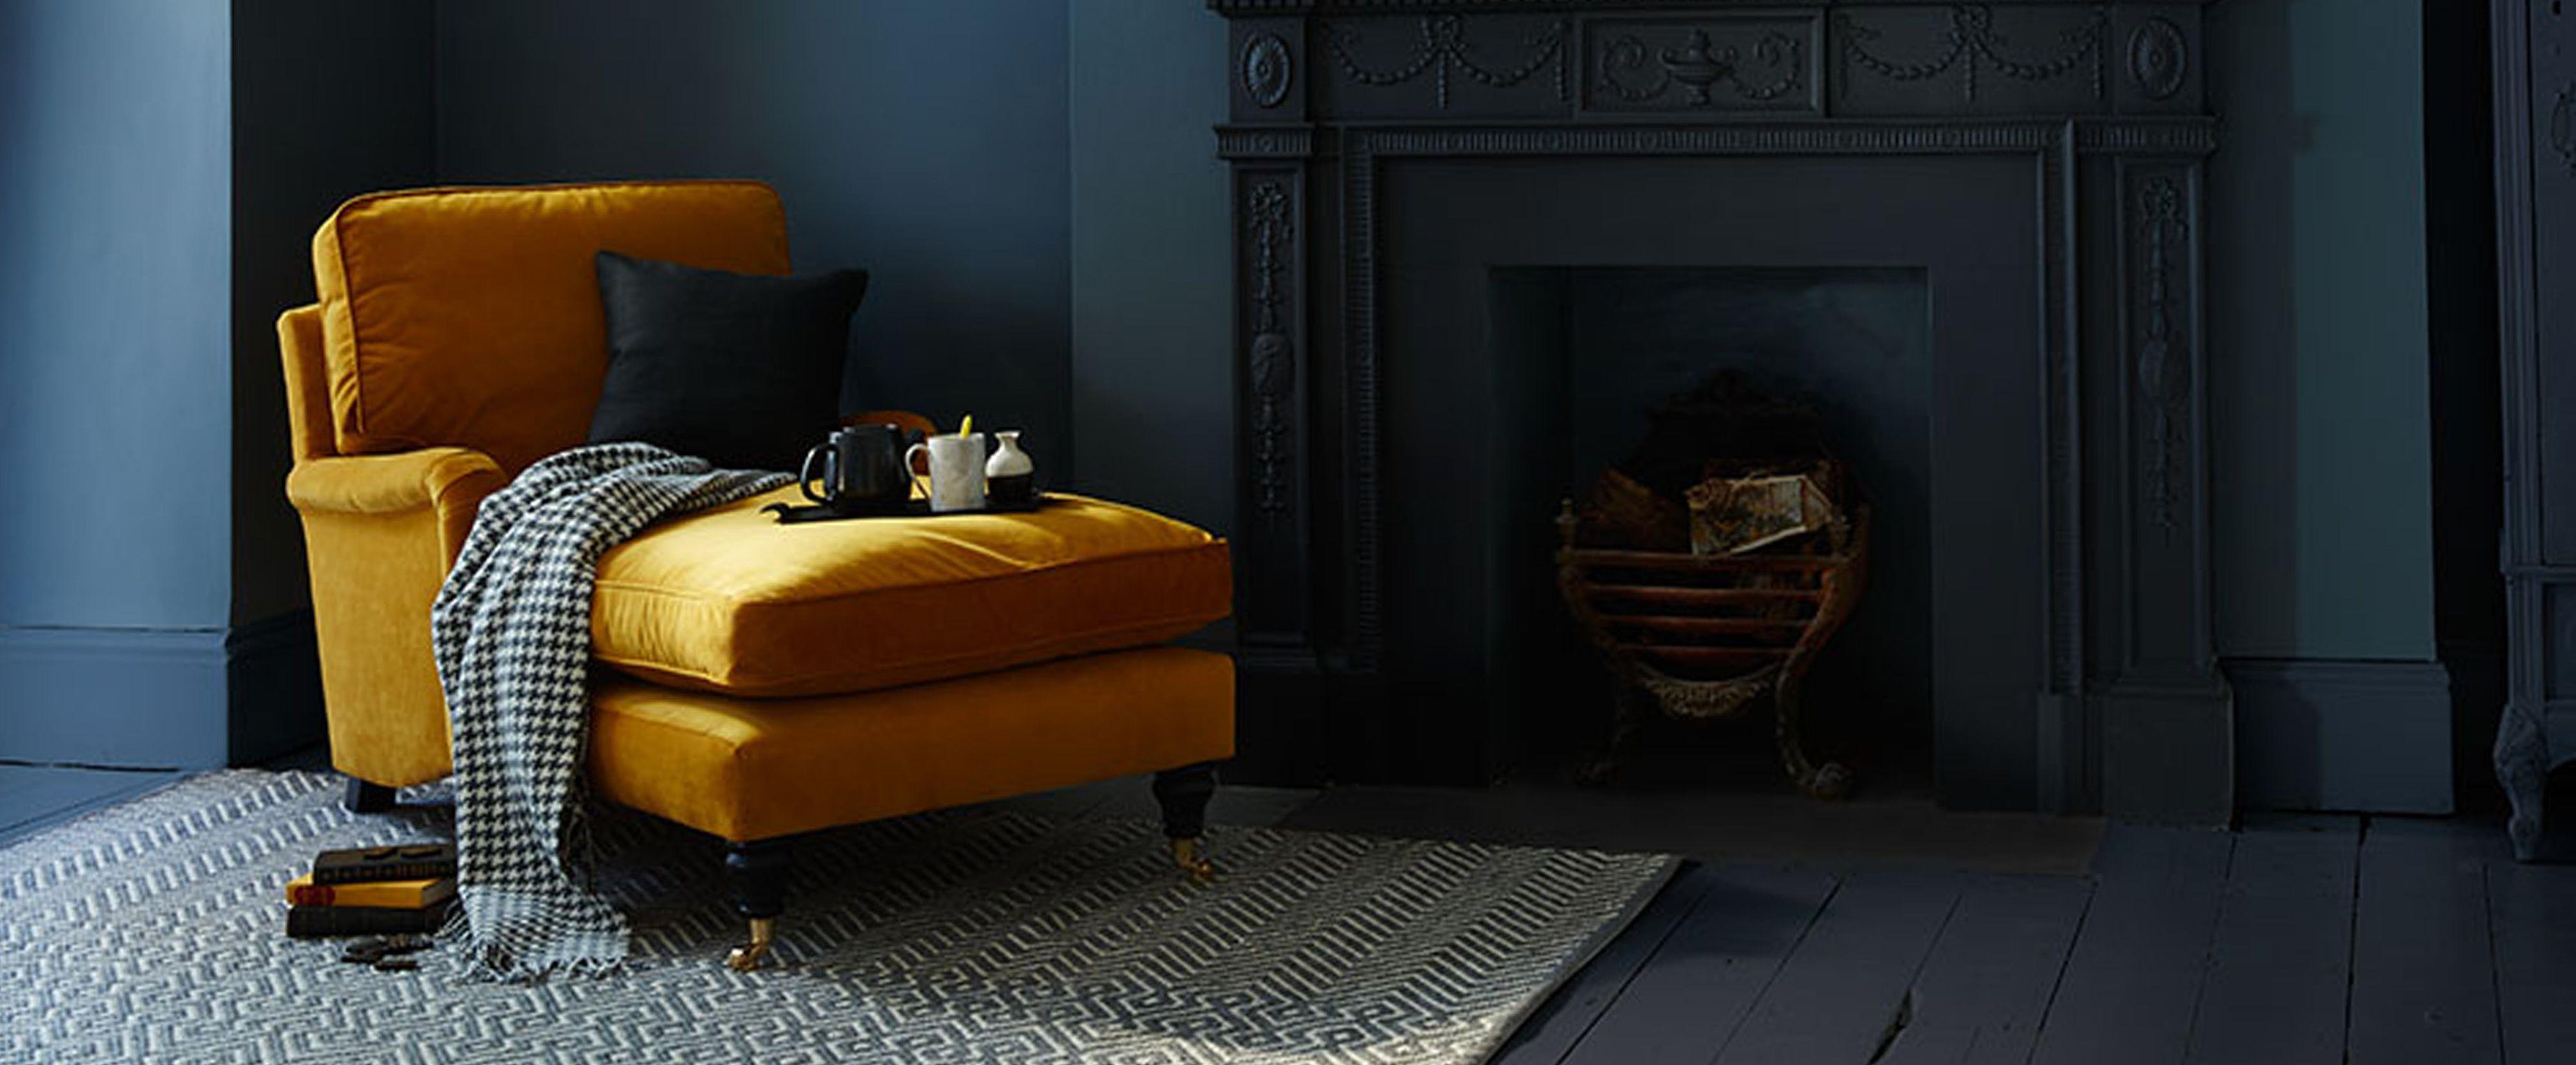 chaise-armchair.jpg